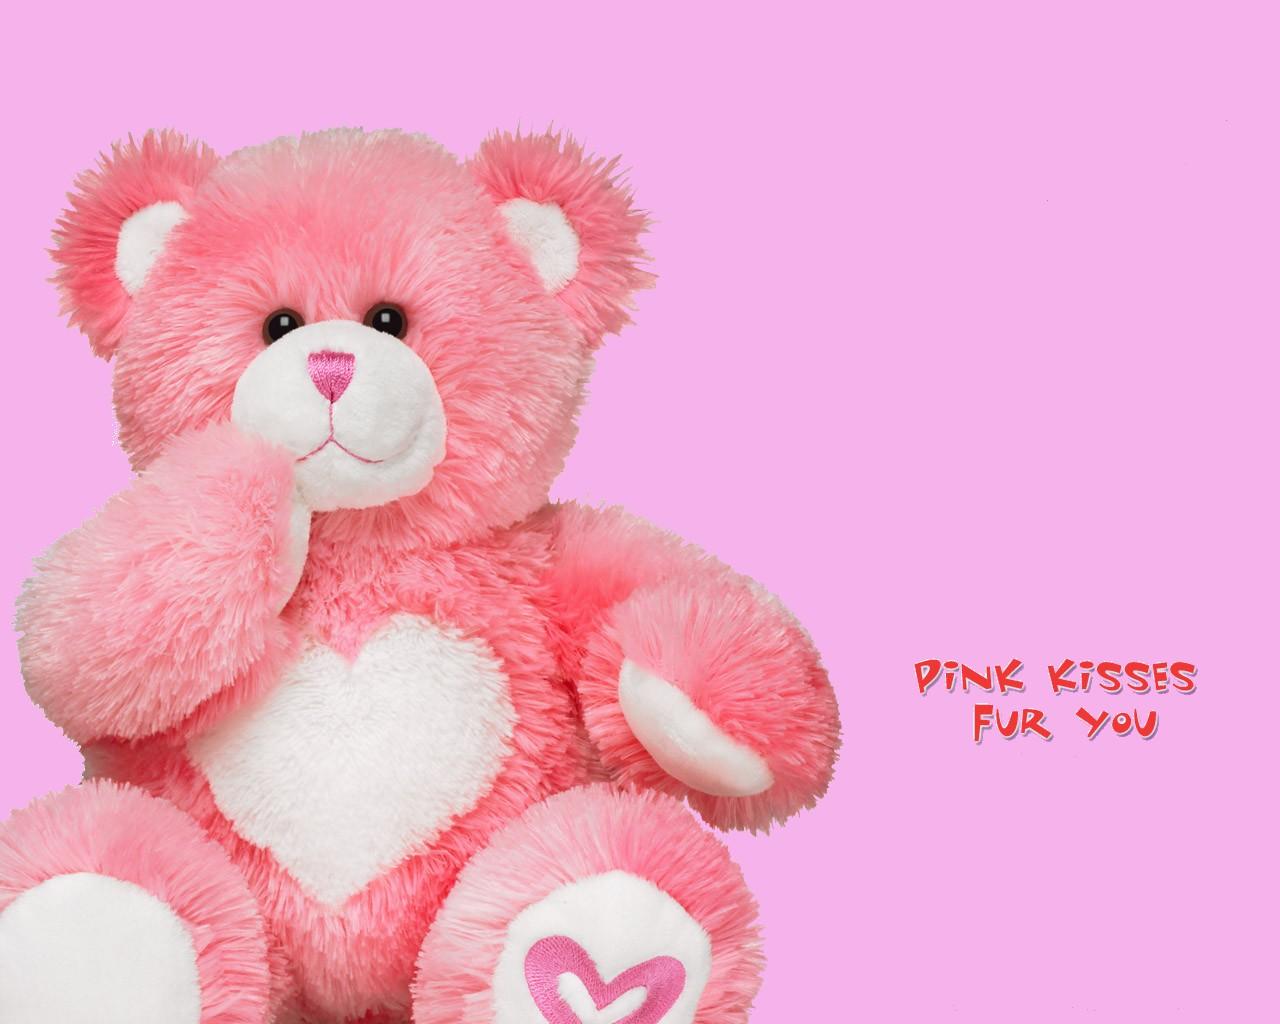 Teddy Bear Cute Ballet Wallpaper Wide 10079 Wallpaper WallpaperLepi 1280x1024